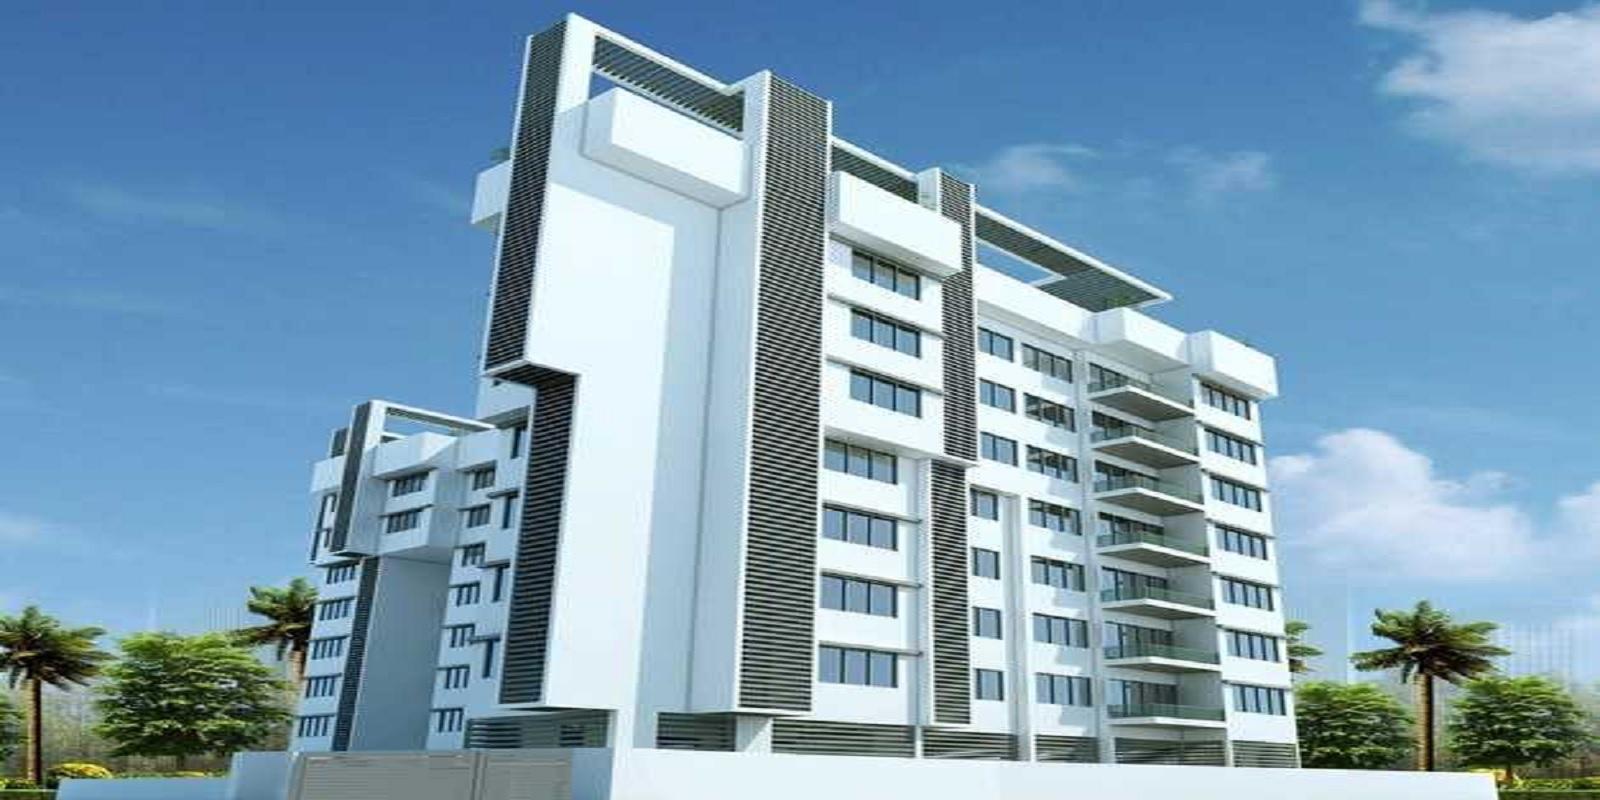 s raheja gurukripa project project large image1